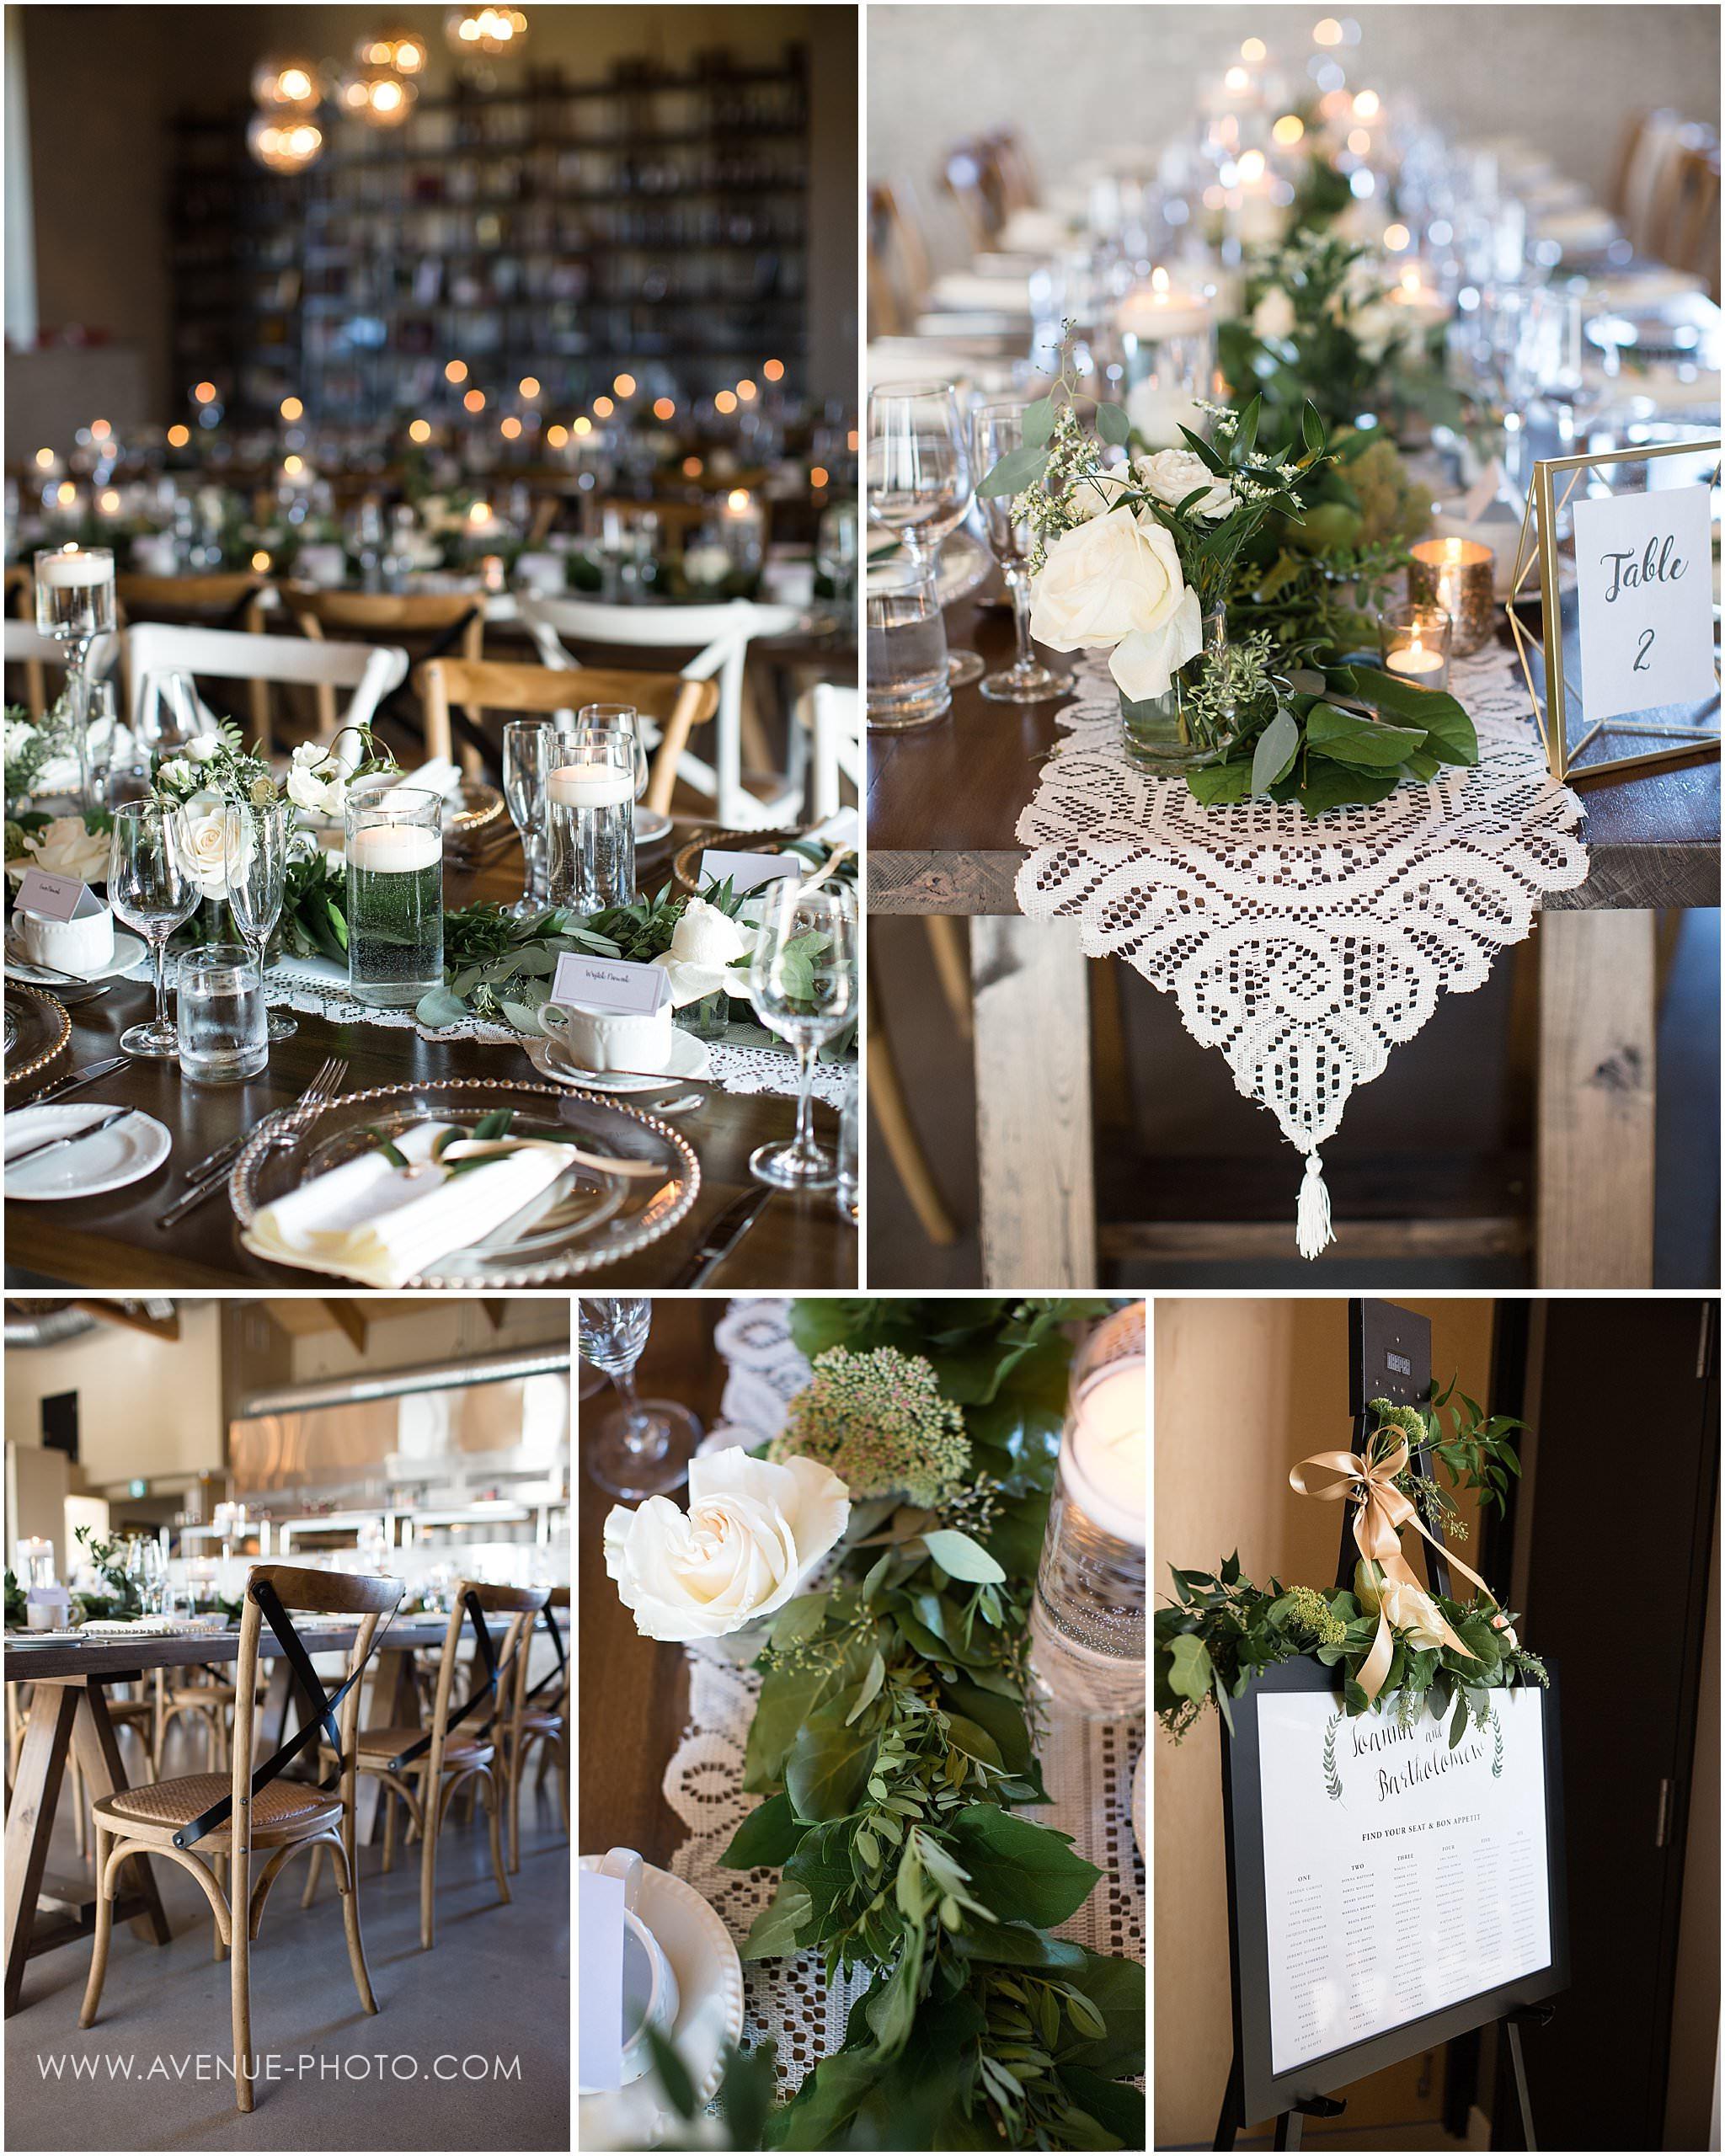 Adamo Estate Winery Wedding Photos, Hockley Valley Wedding Photos, Orangeville Wedding Photos, Vineyard Wedding, Avenue Photo, Boho Wedding, Luxury Wedding, Pinterest Wedding